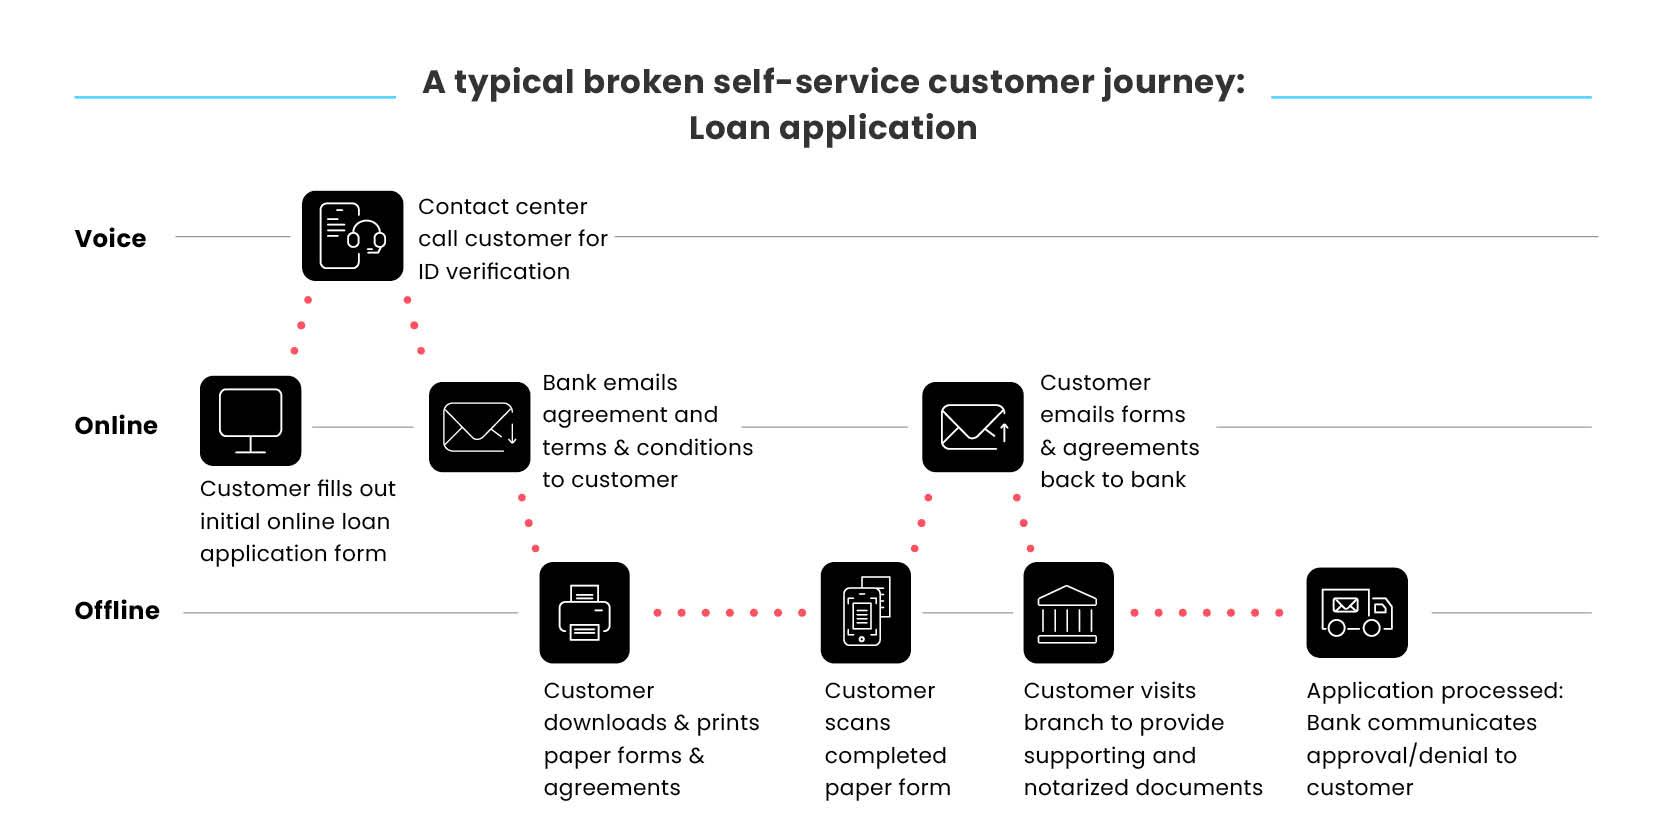 broken-journies-blog-images-bankning-A typical broken self-service customer journey- Loan application